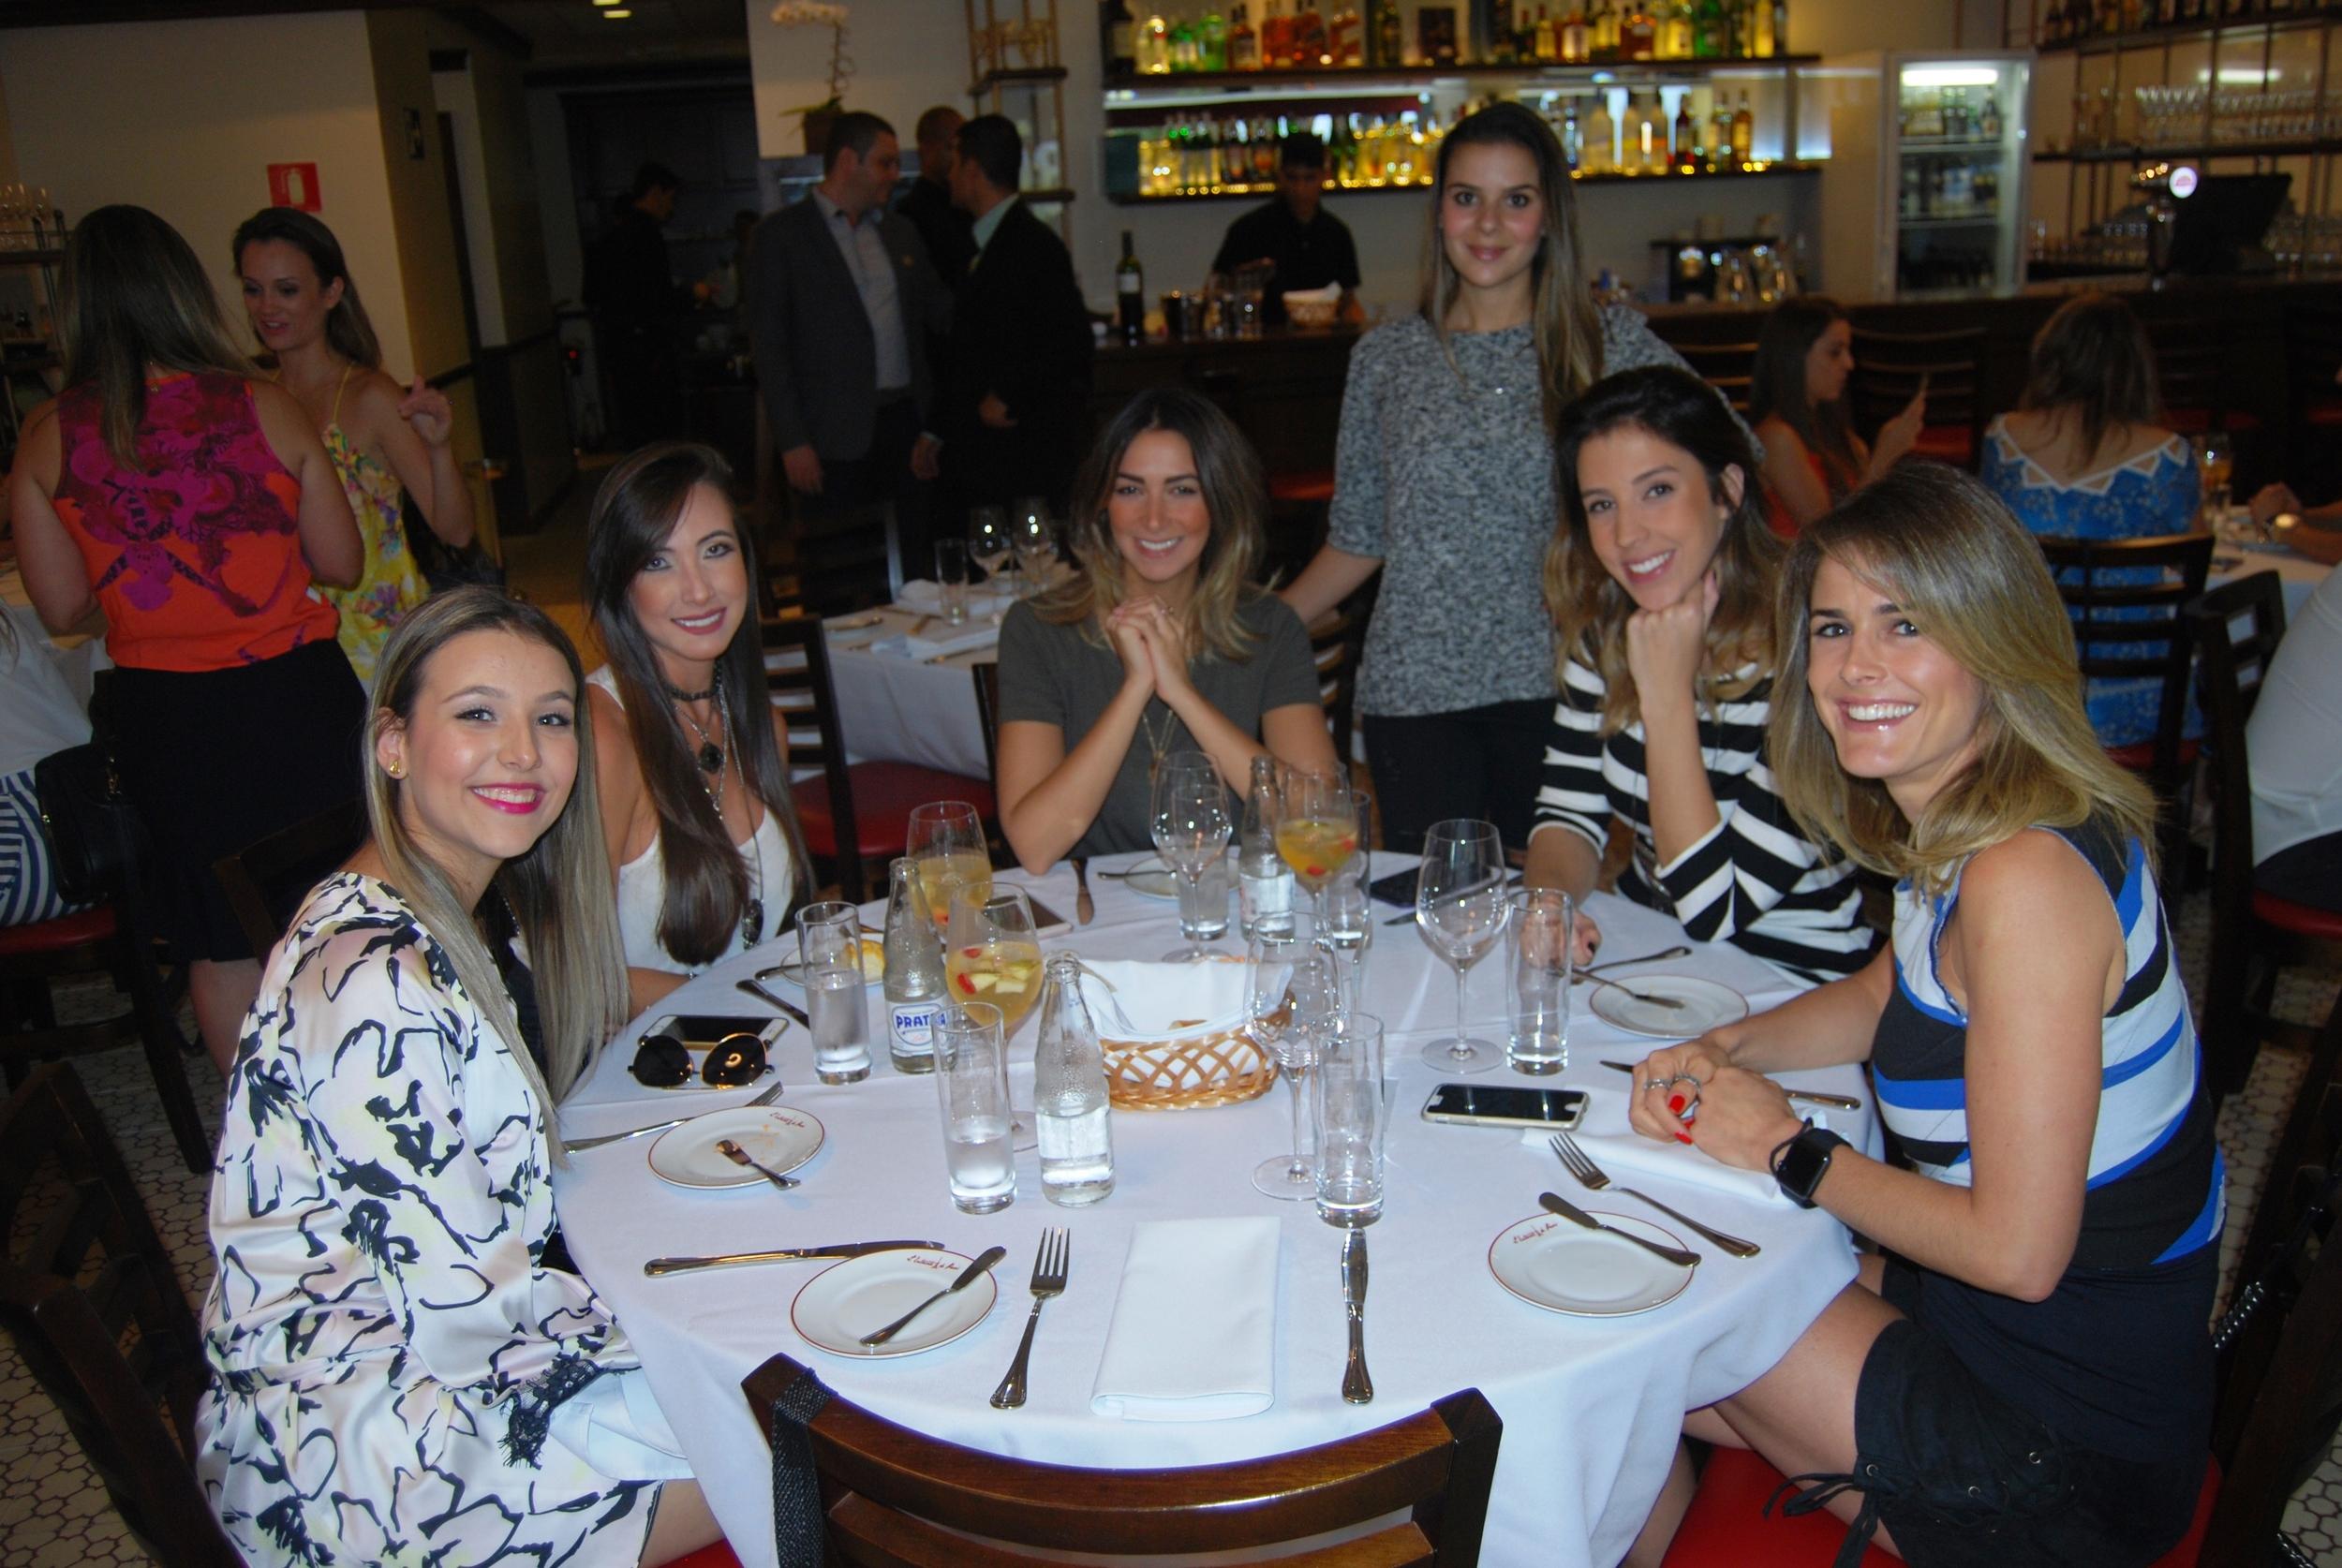 Dandara Azevedo, Luana Delevedove, Lais Rasera, Mari Rezende, Rafaela Bartholomeu e Larissa Buschinelli  .JPG